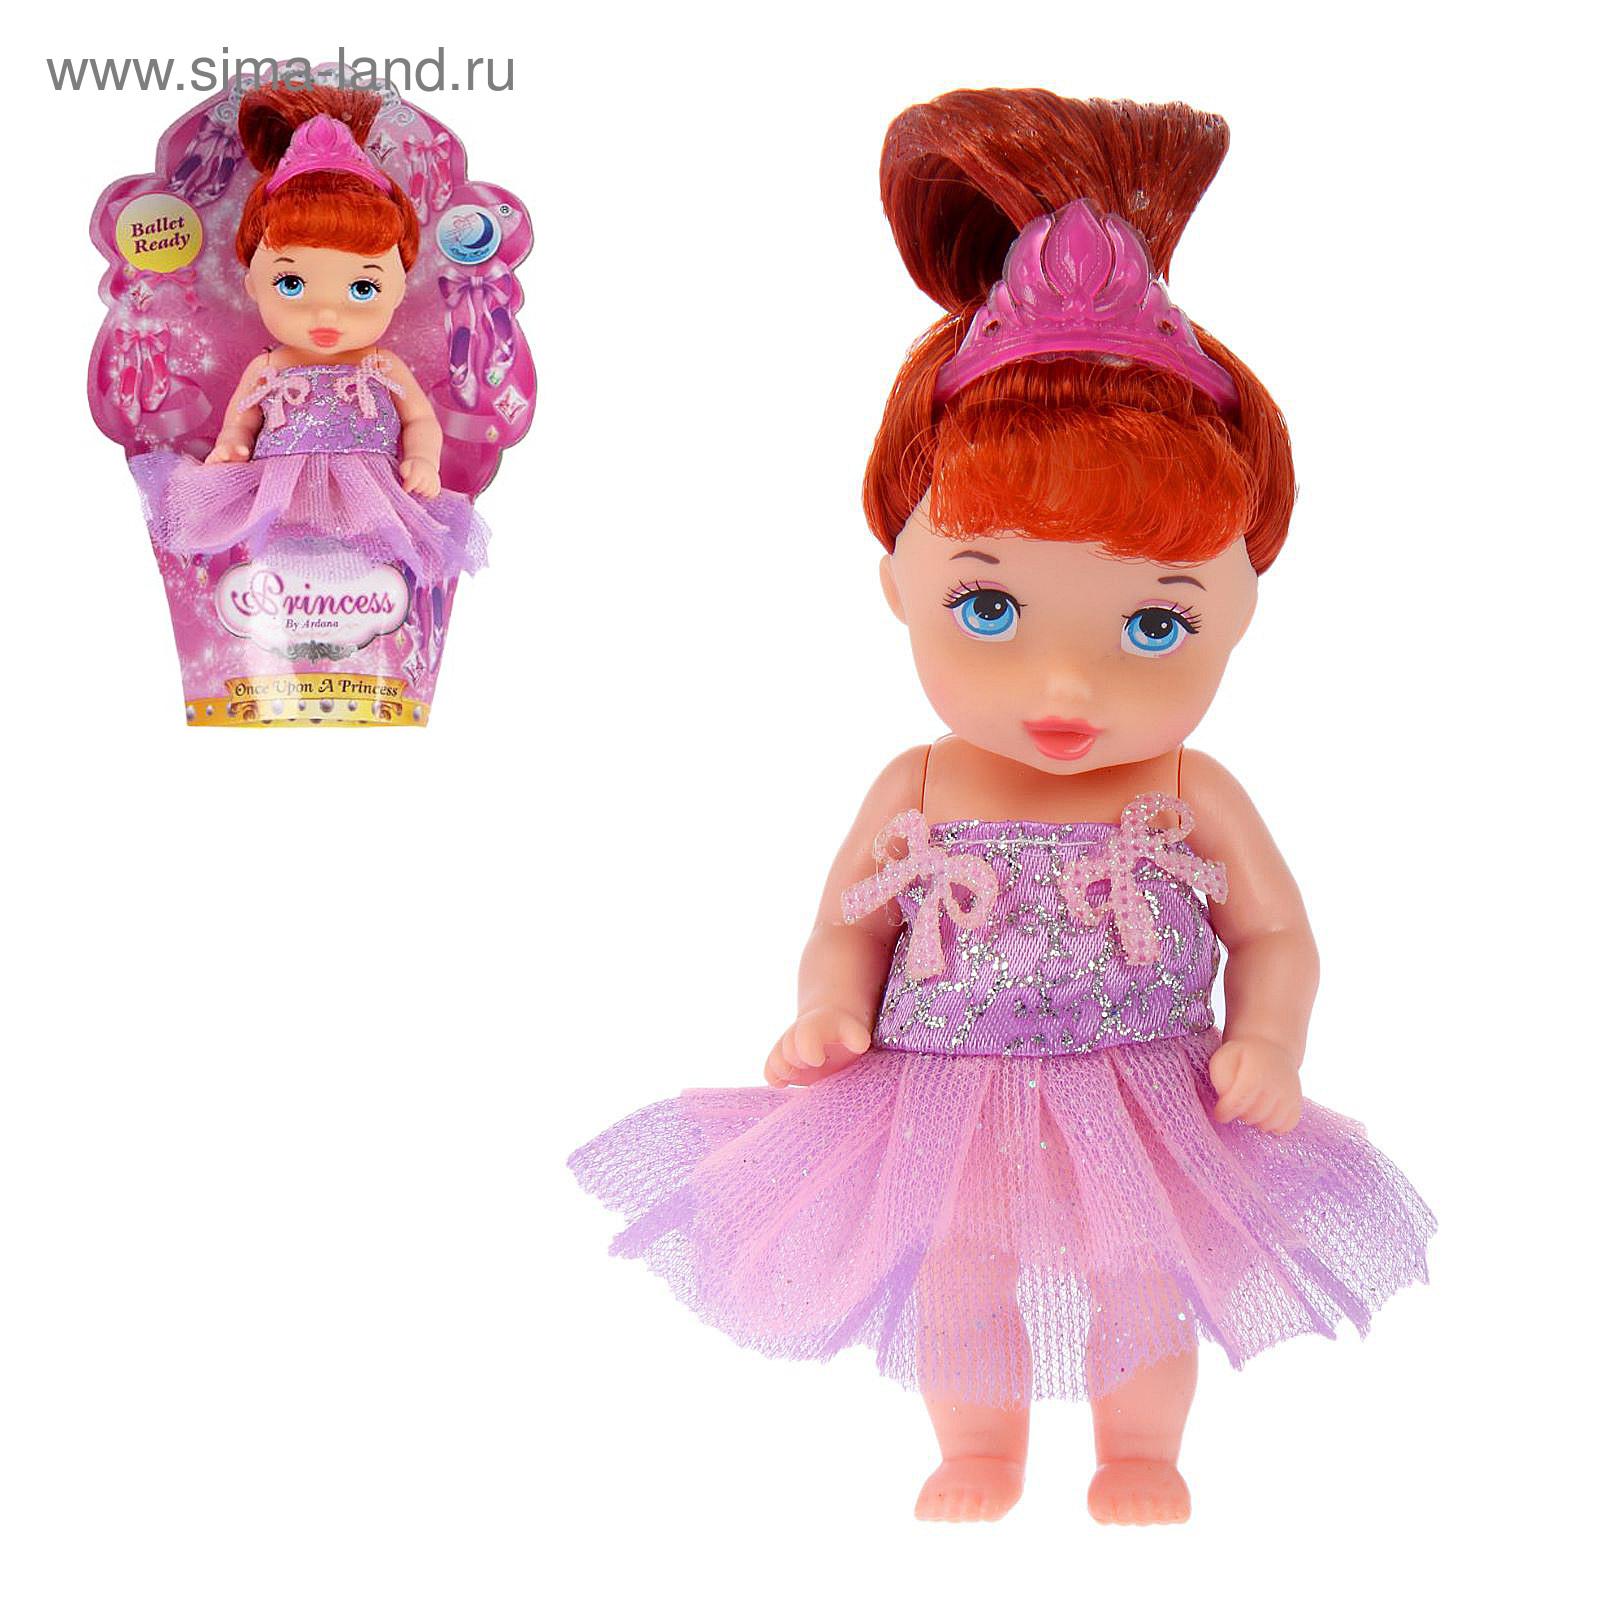 c613a862ce1 Кукла малышка